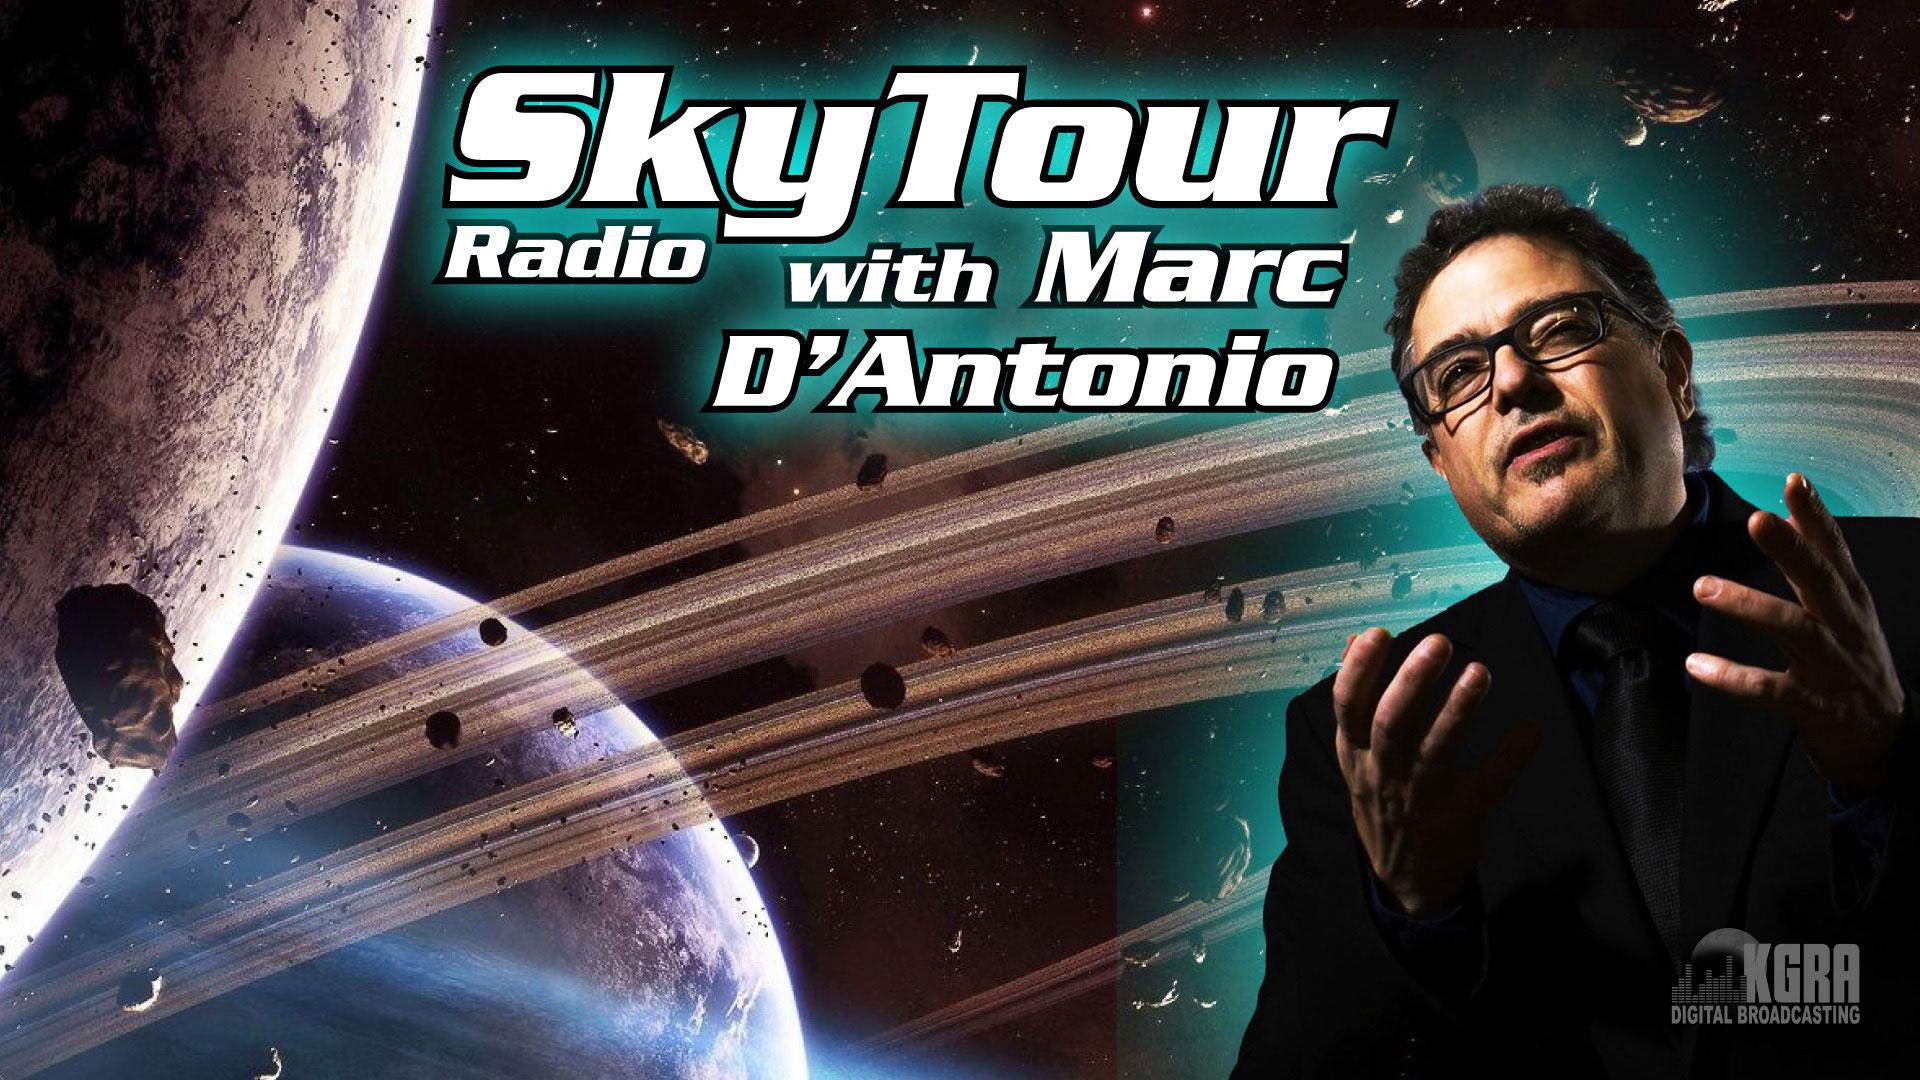 Sky Tour Radio - Marc D'Antonio